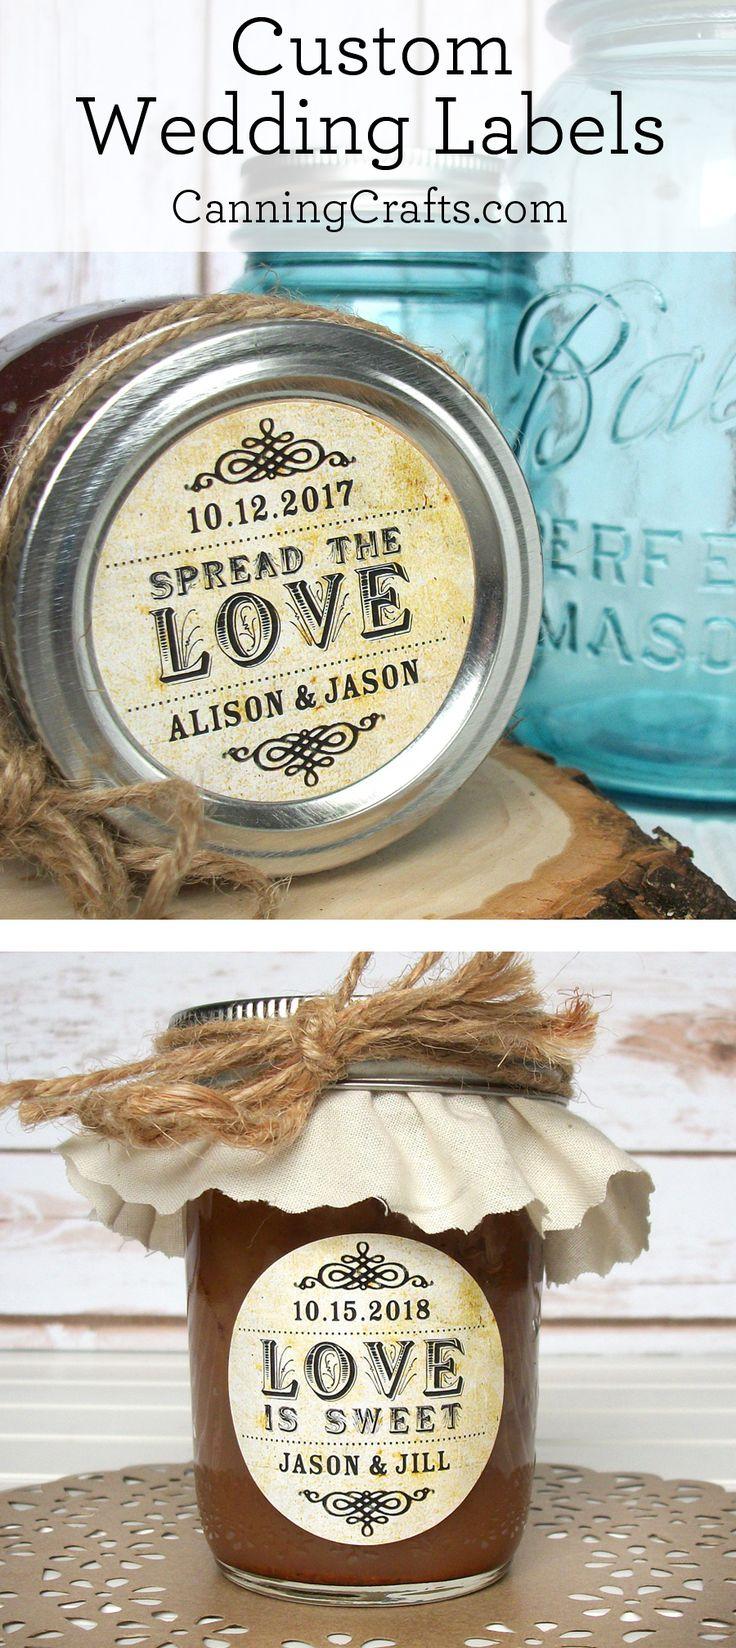 25+ Best Ideas About Wedding Favor Labels On Pinterest